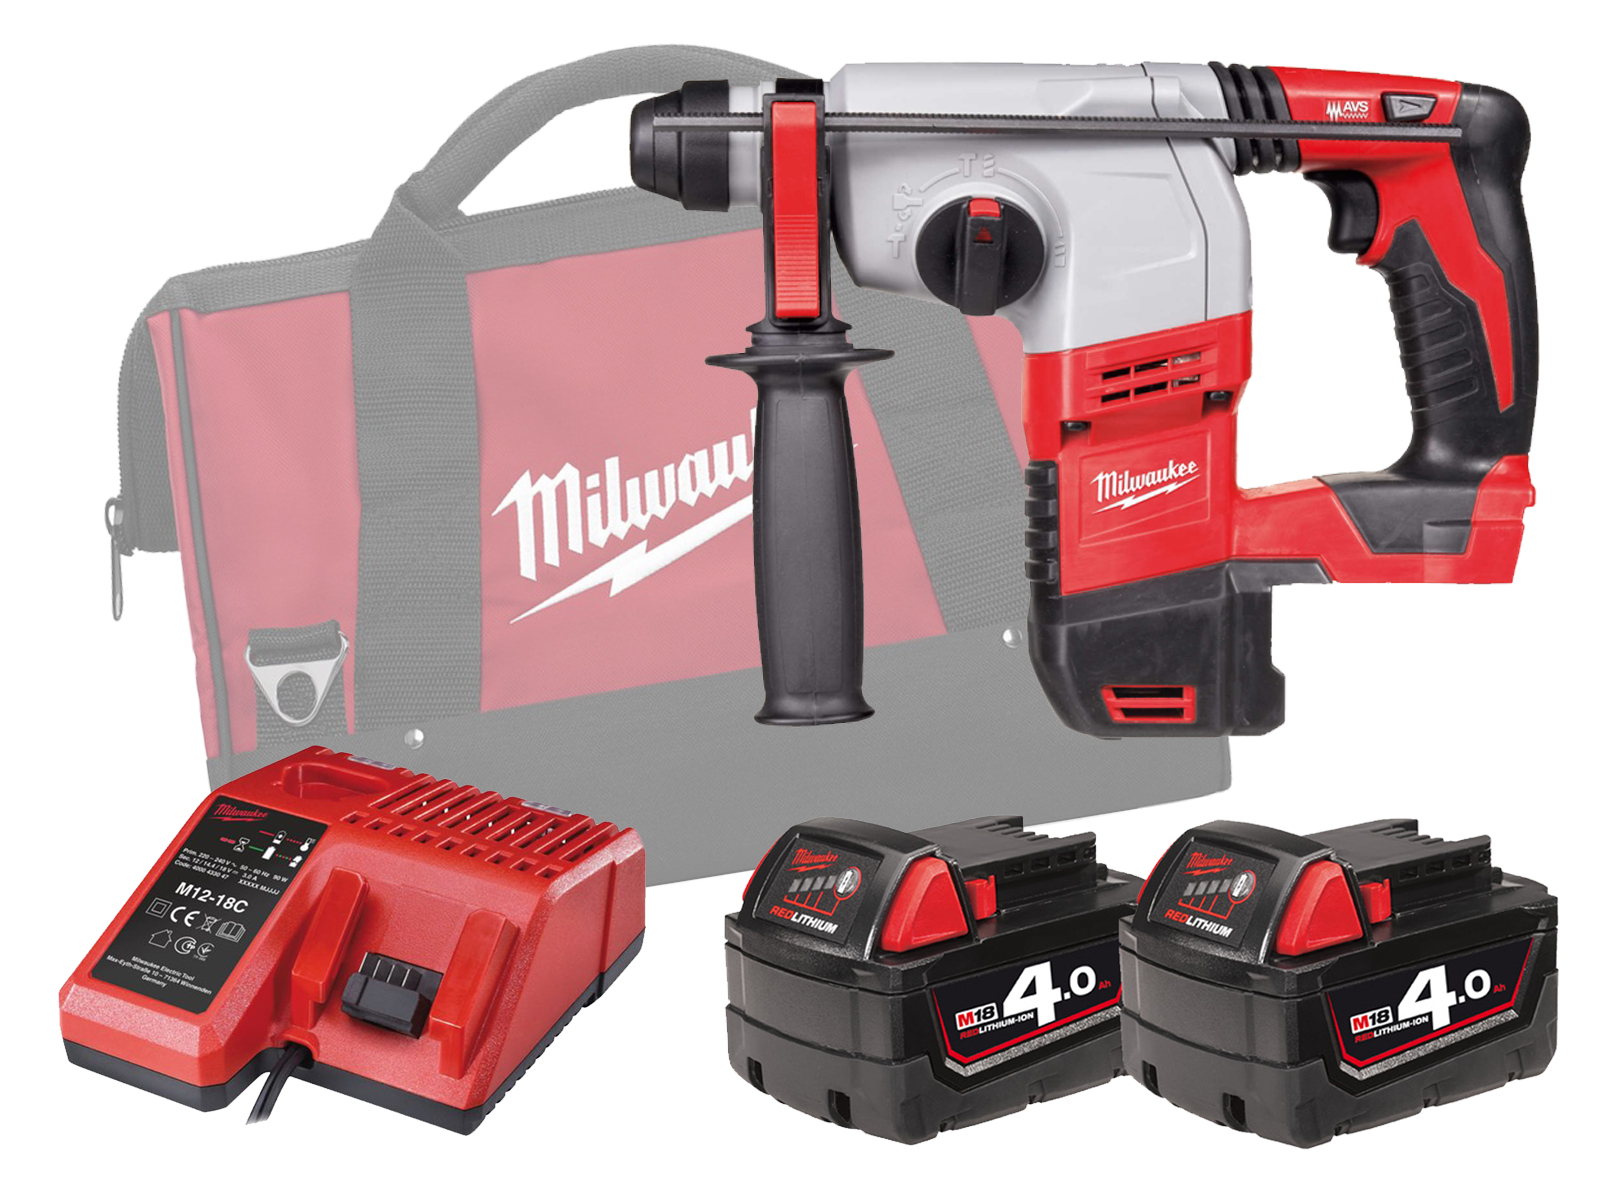 Milwaukee HD18HX 18V Brushed 3-Mode SDS Plus Hammer - 4.0Ah Pack